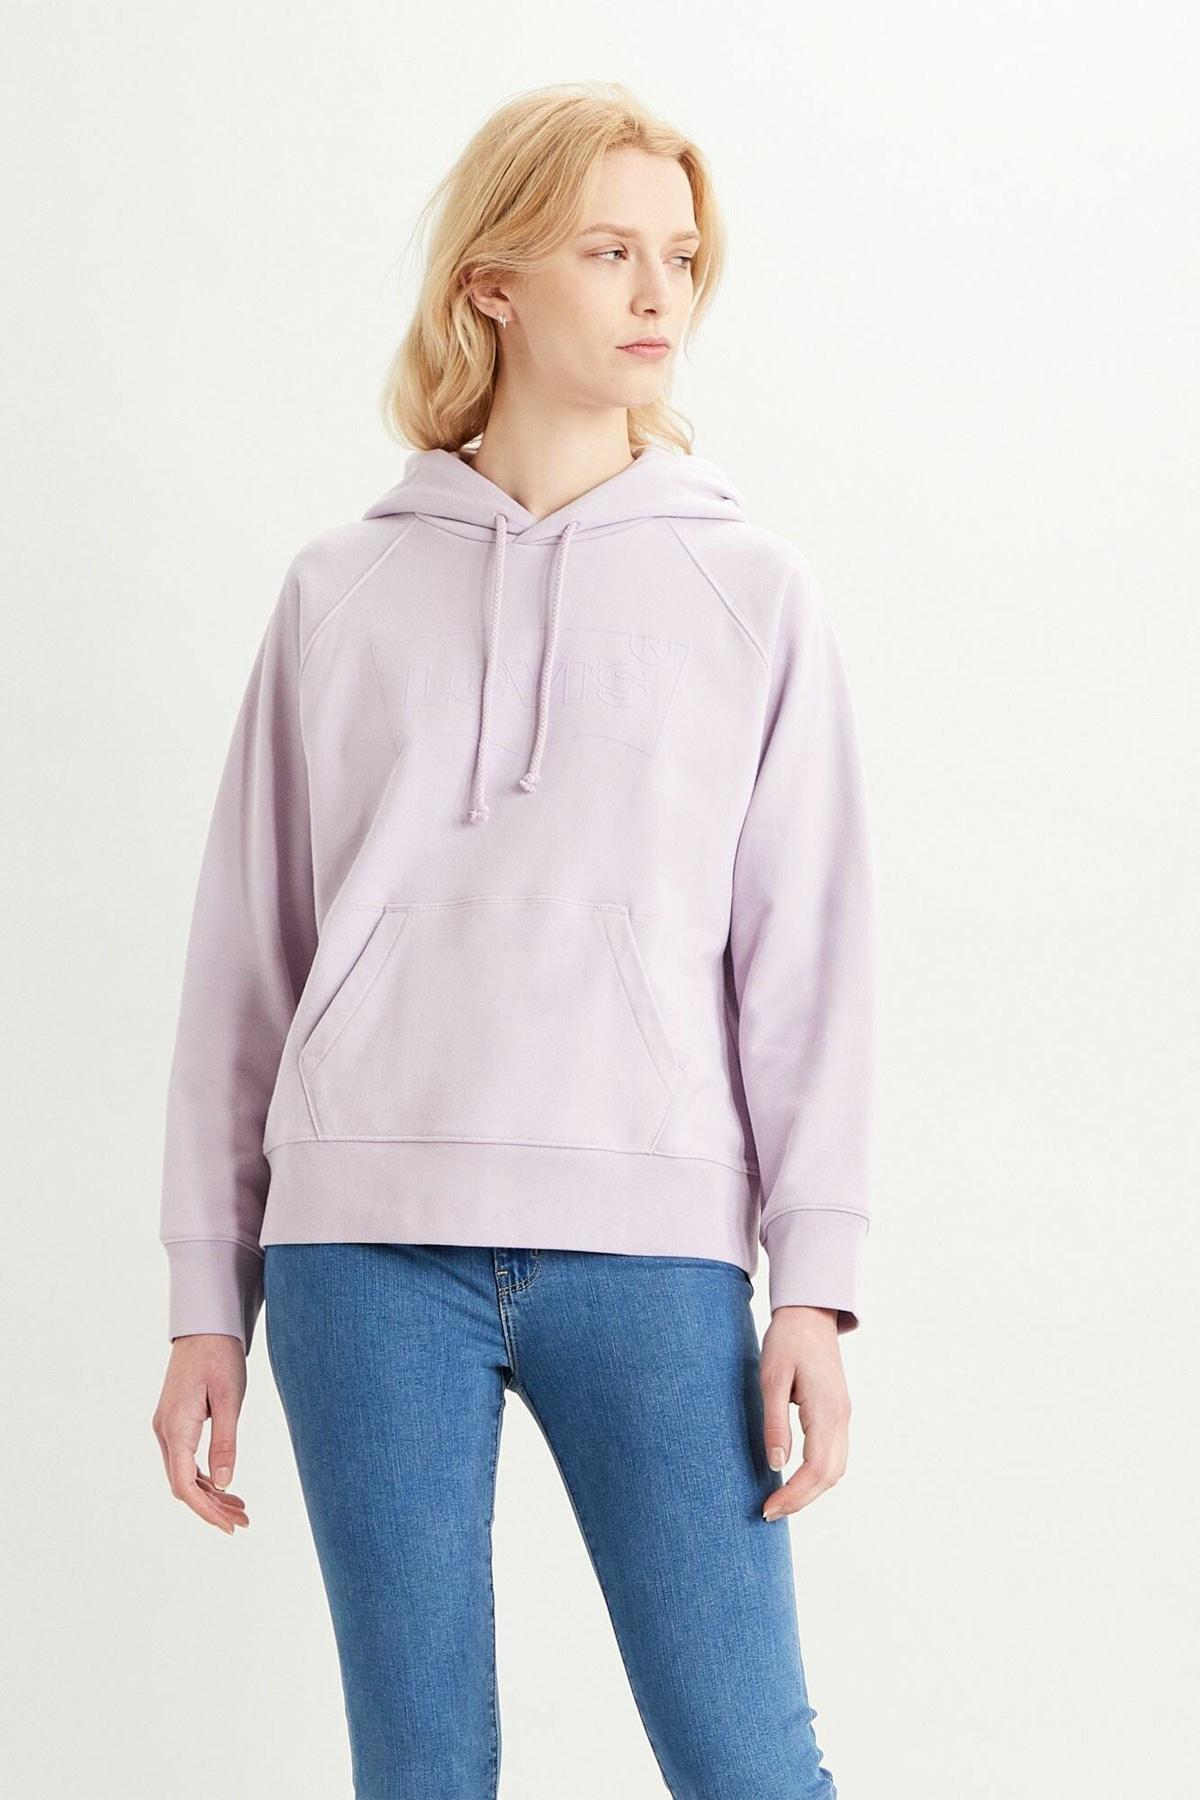 Levi's Kadın Graphic Sport Hoodie Sweatshirt 35946-0206 1